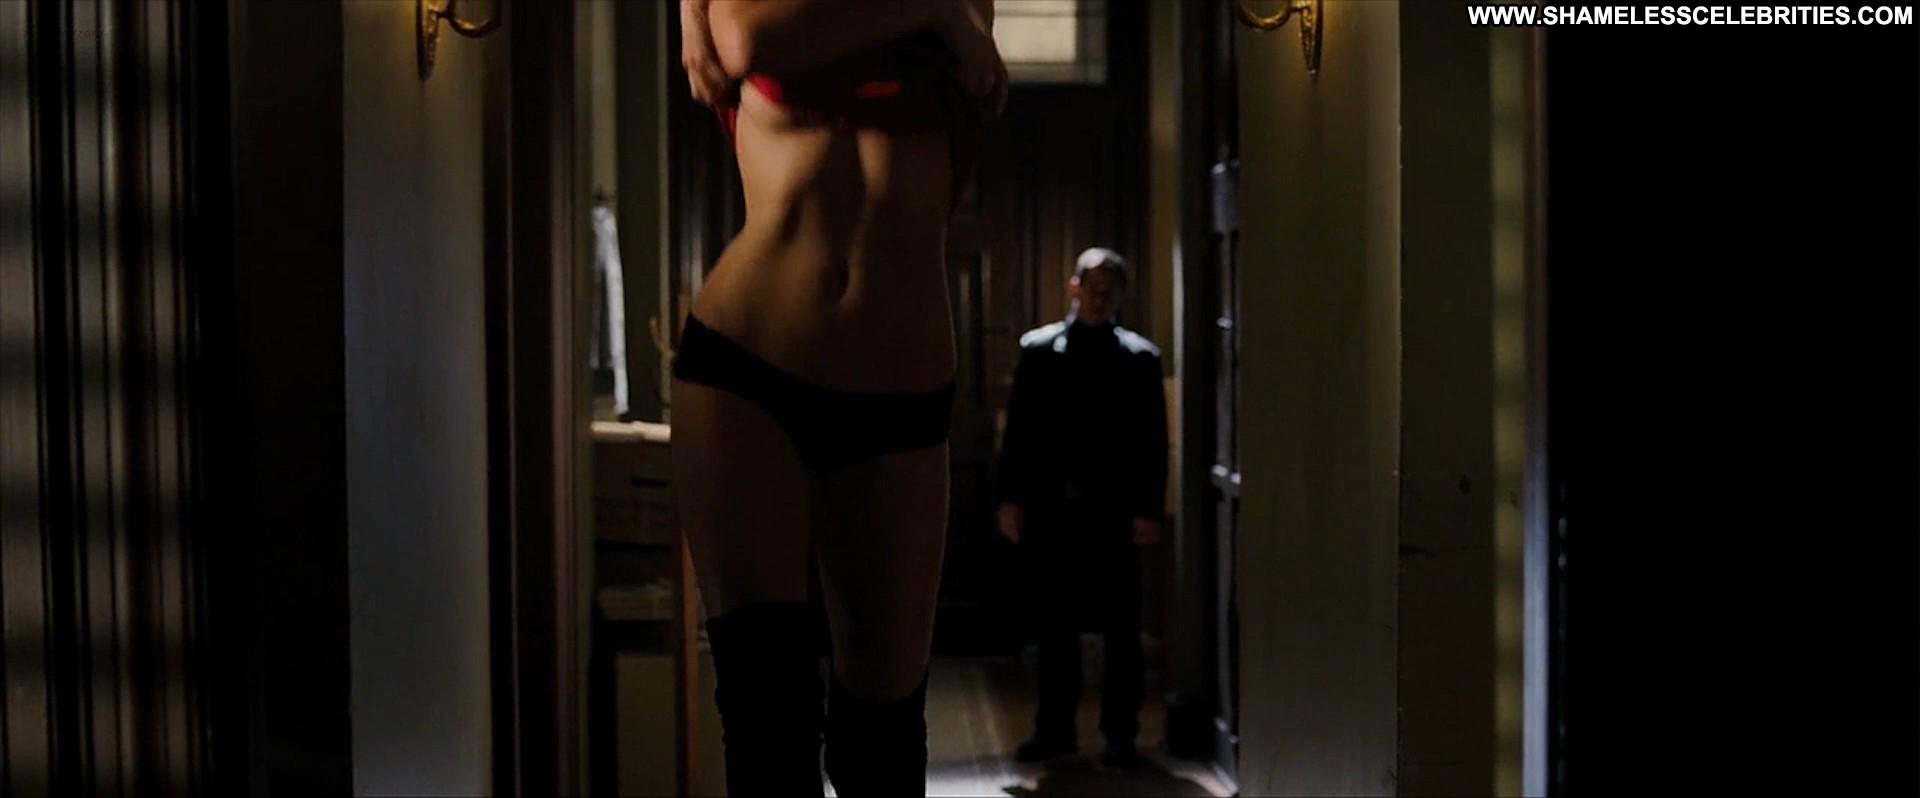 Hot naked sexy latinas nude